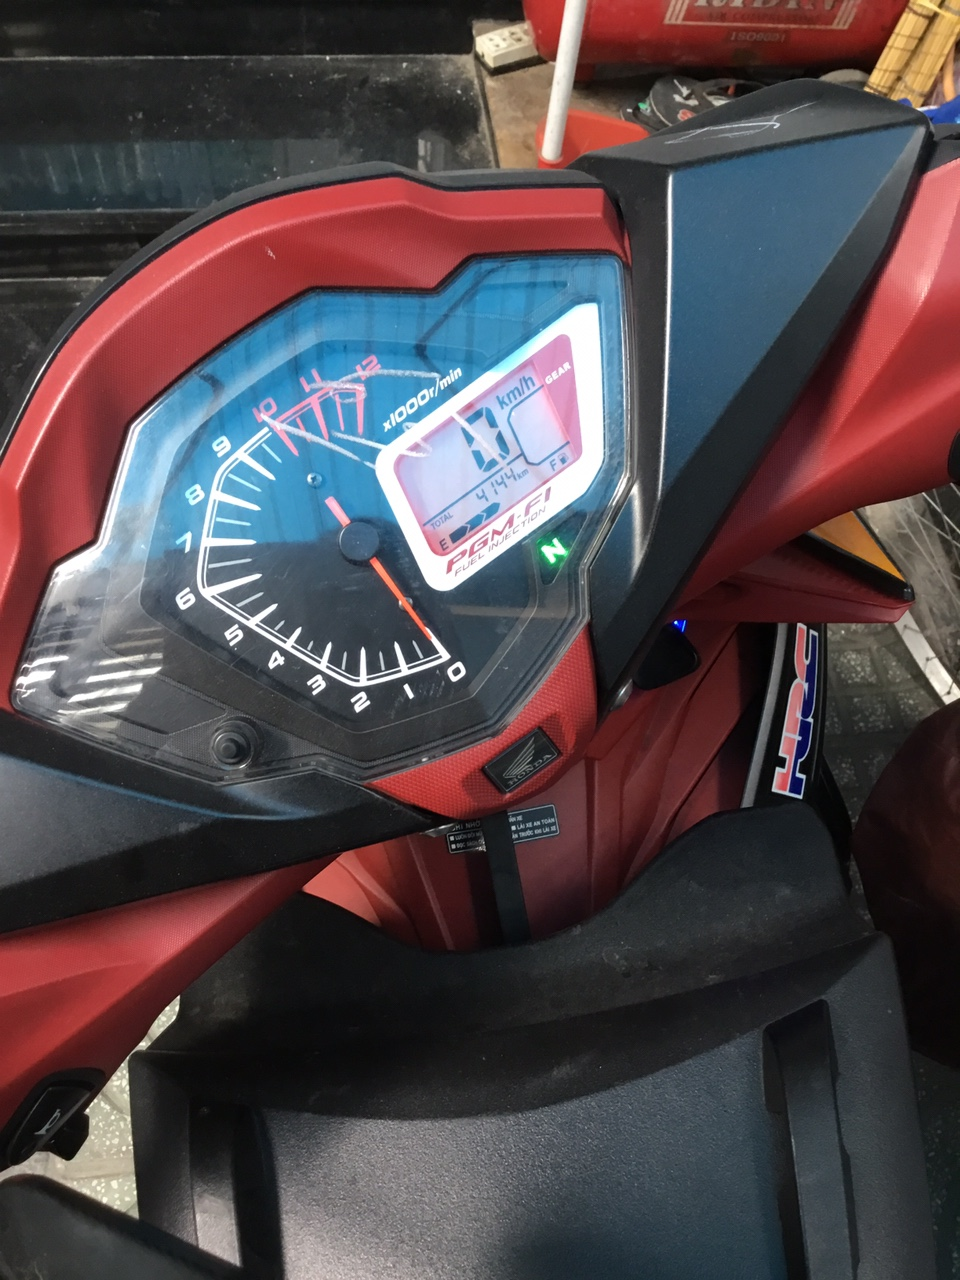 Honda Winner DK 012017 ODO 4KBien SG 1 doi chinh chu Zin 100